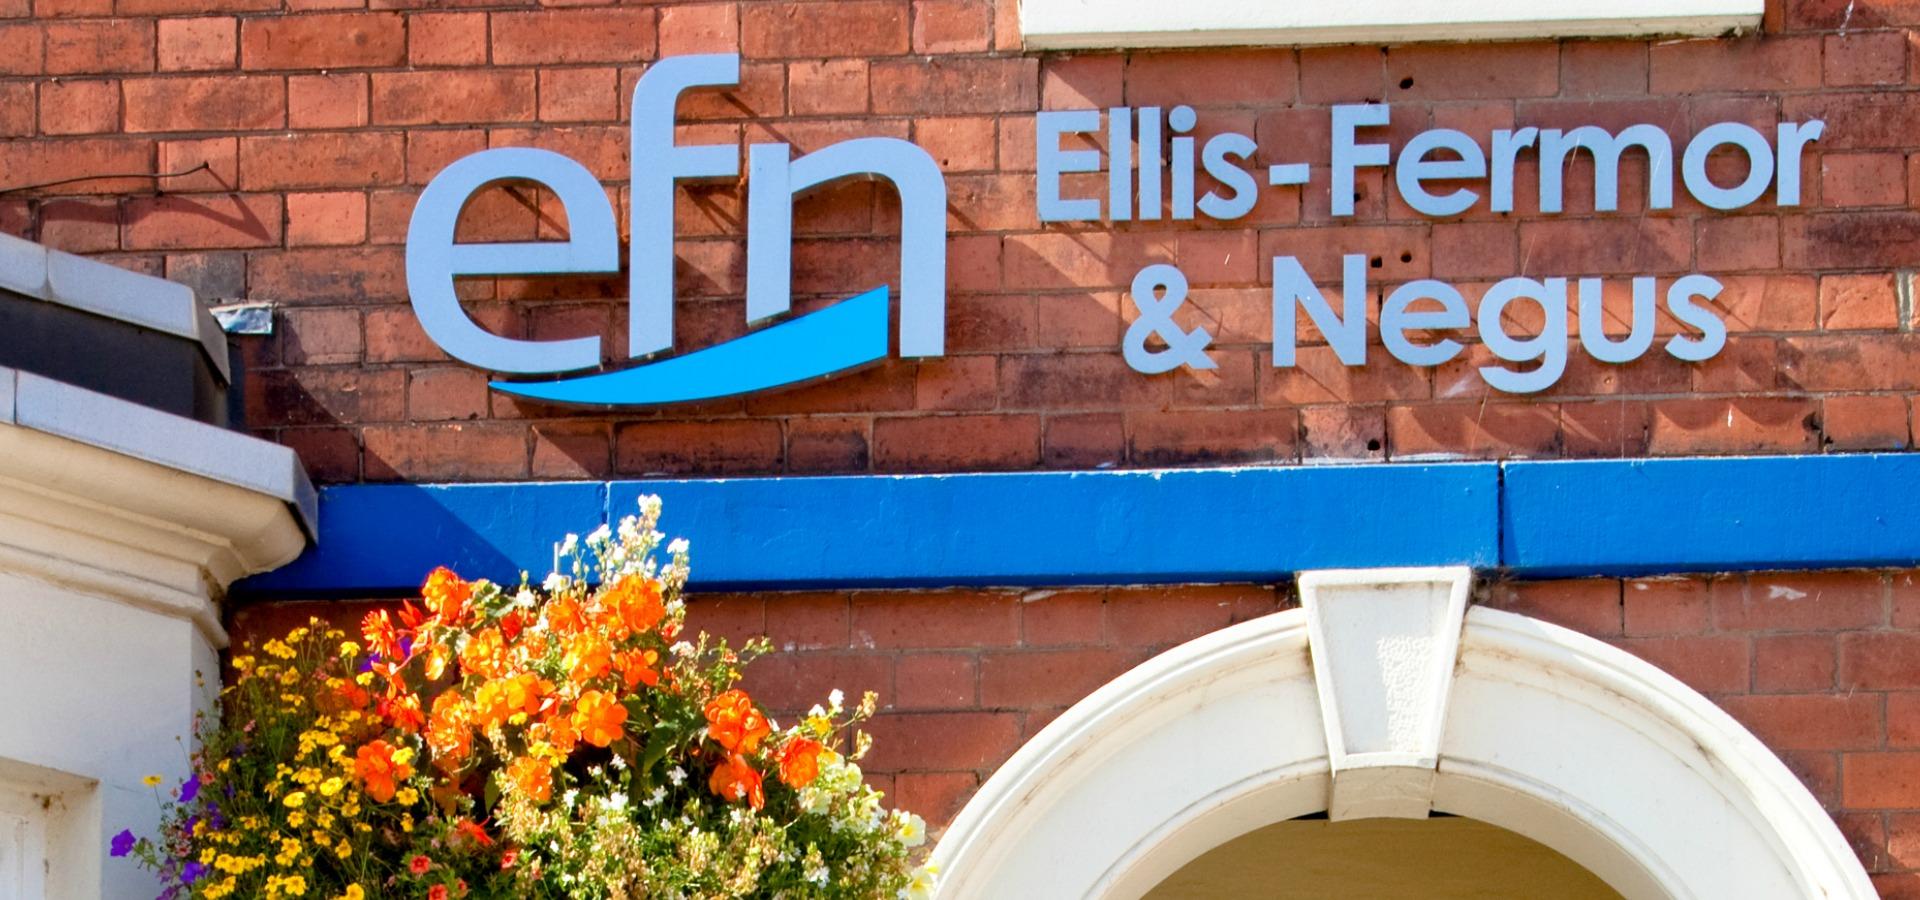 Ellis-Fermor & Negus offices